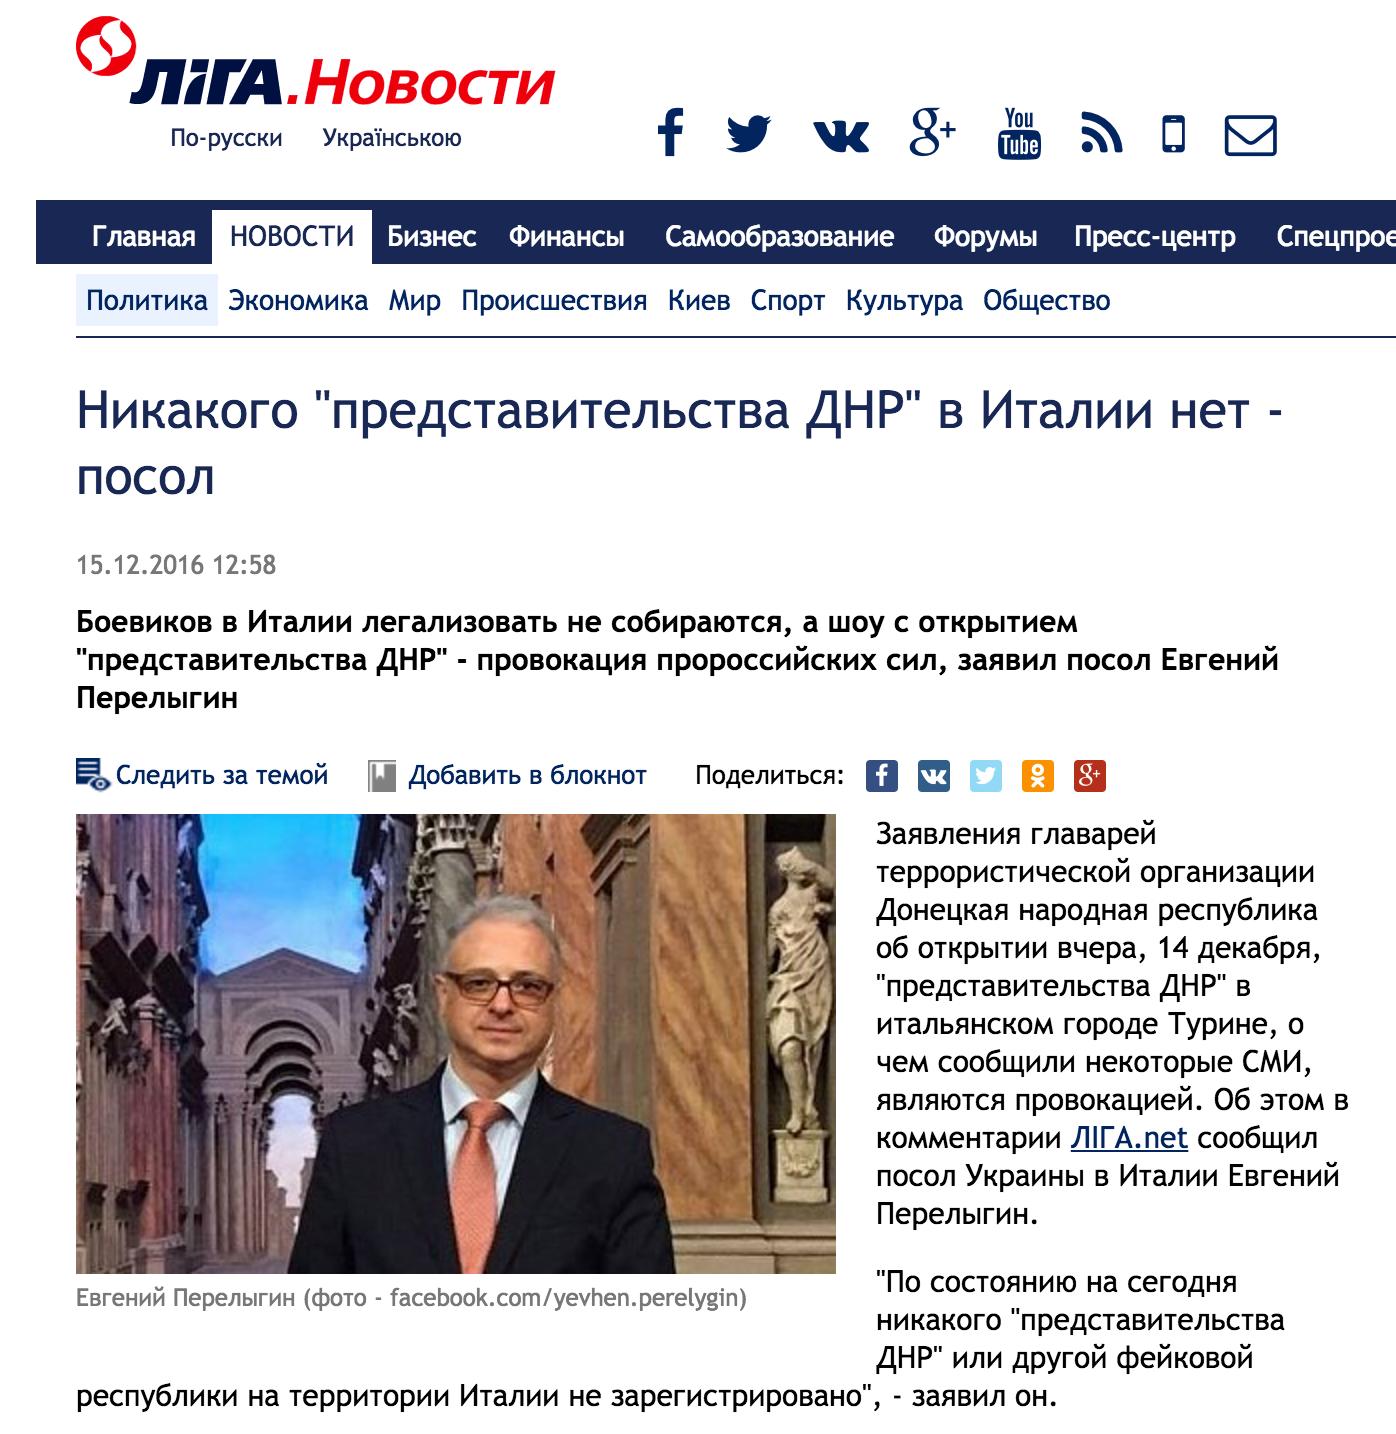 propagande russe fake